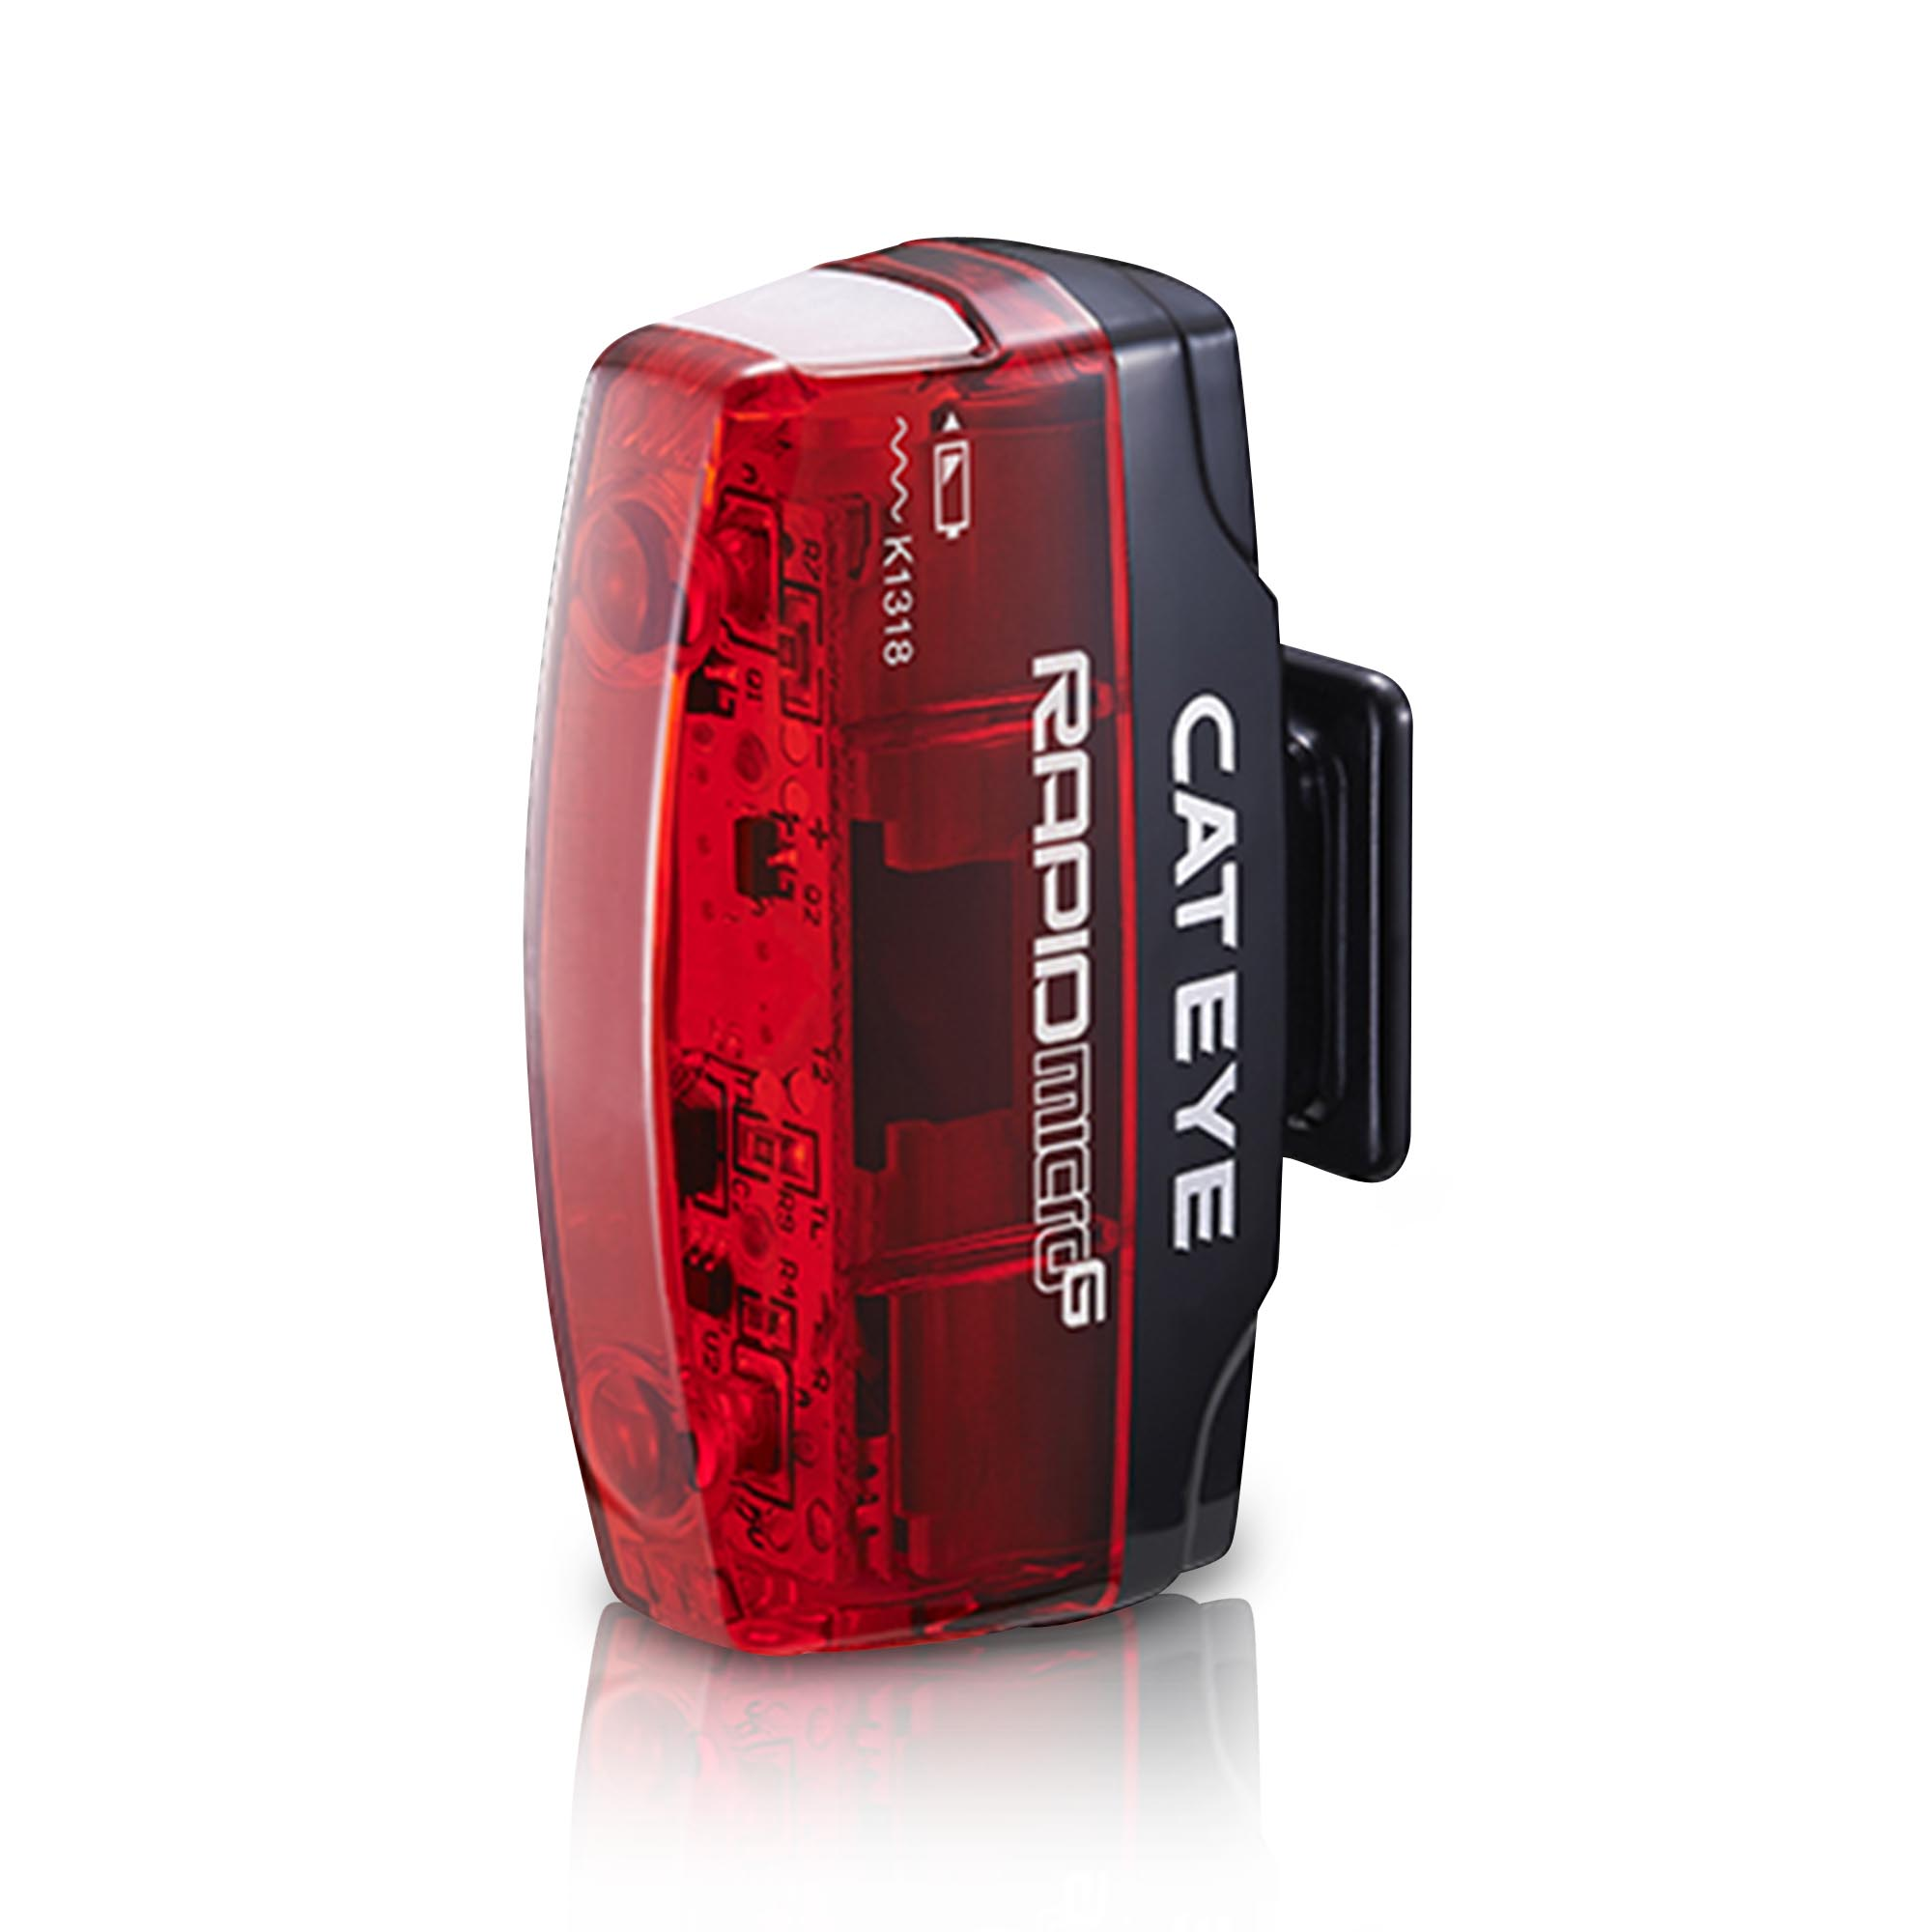 CatEye Co., LTD Cateye RAPID MICRO G TL-LD 620G LED-Fahrrad-Rücklicht FA003521049